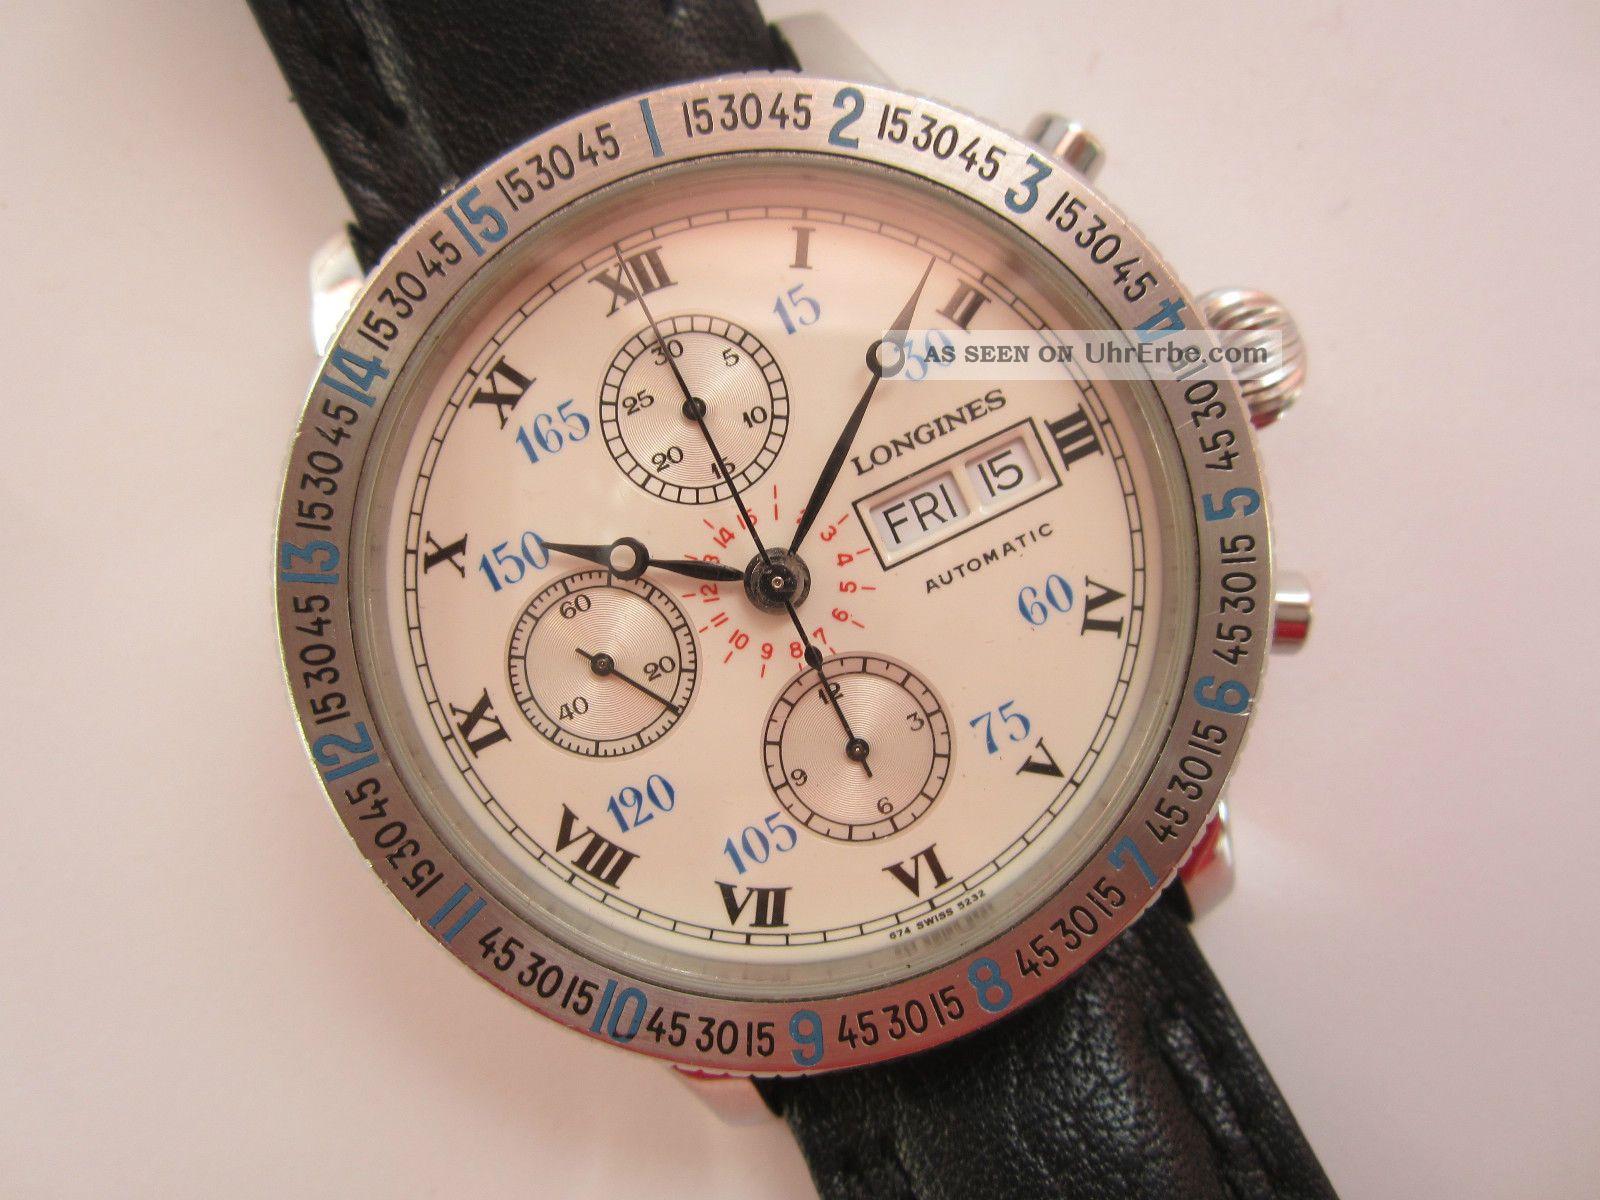 Longines Charles Lindbergh Chronograph Automatic Stundenwinkel Uhr Glasboden Armbanduhren Bild